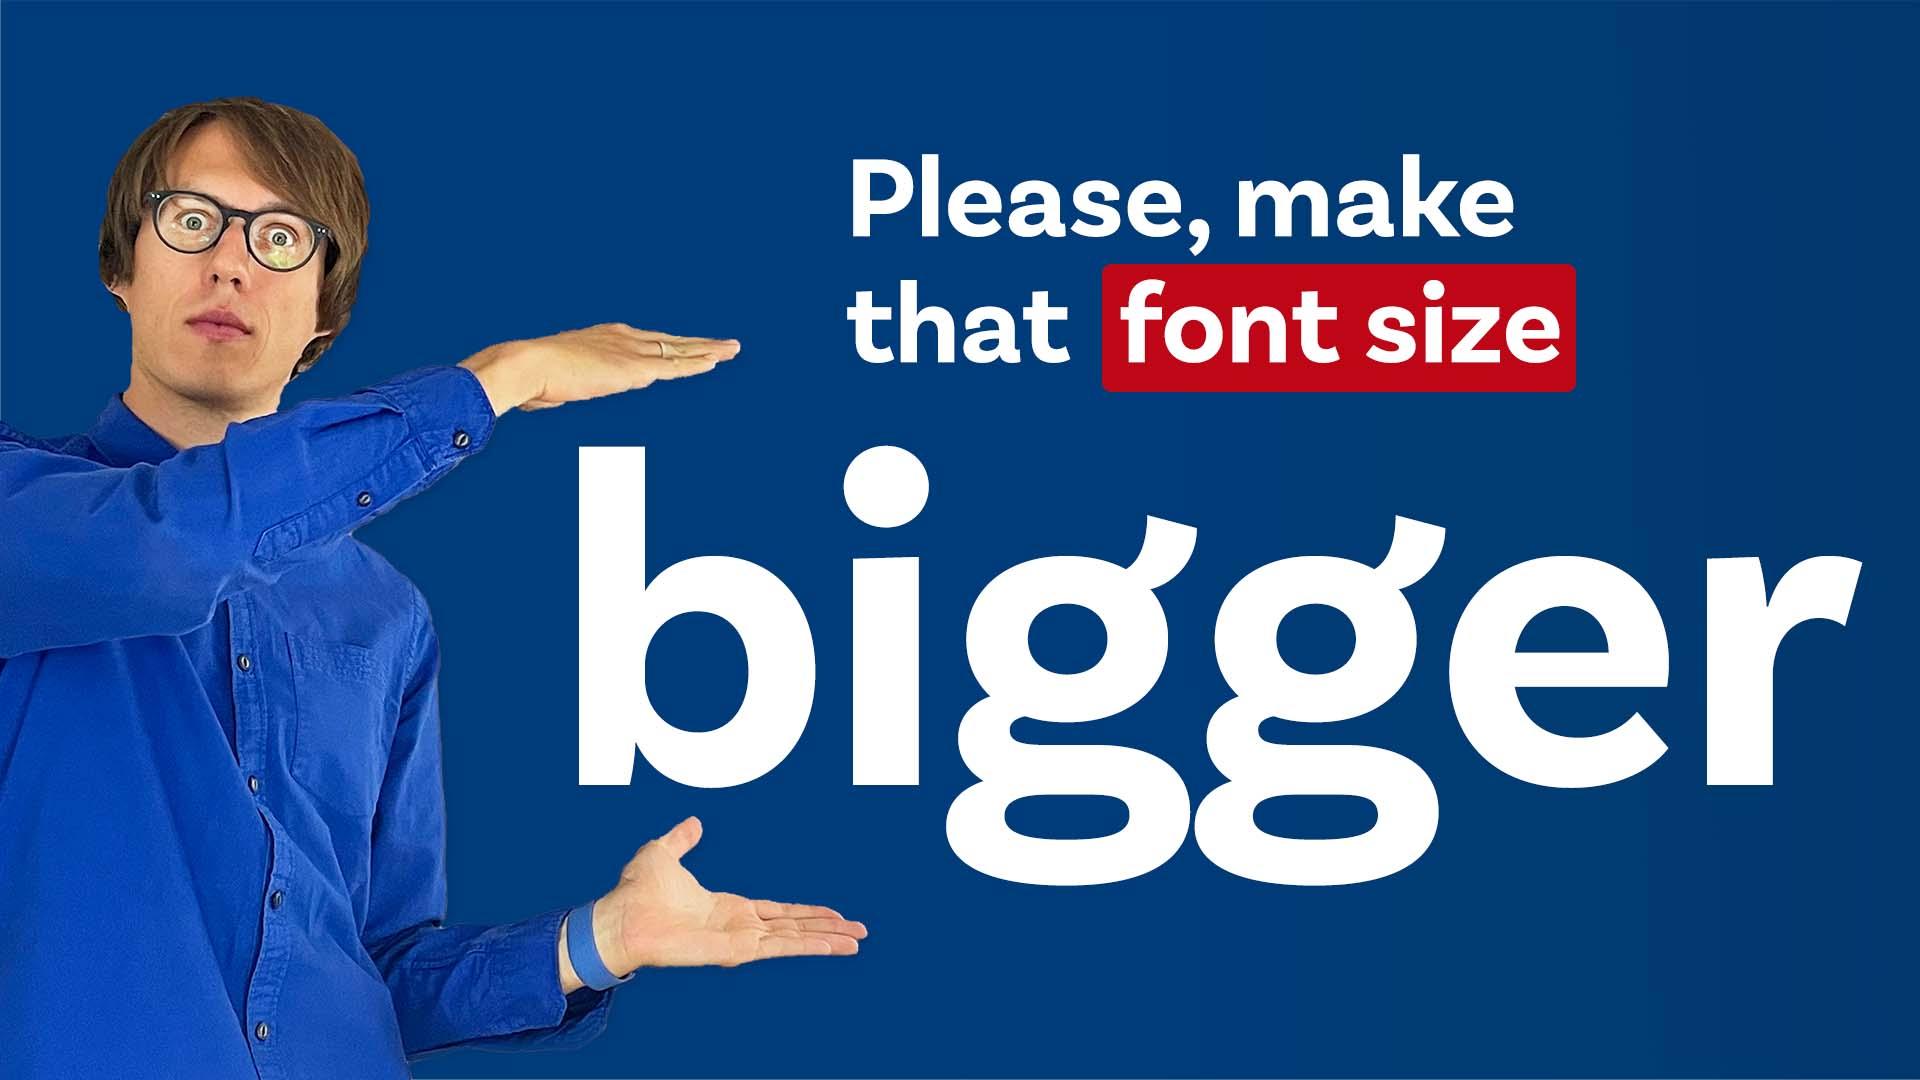 Please, make that font size bigger